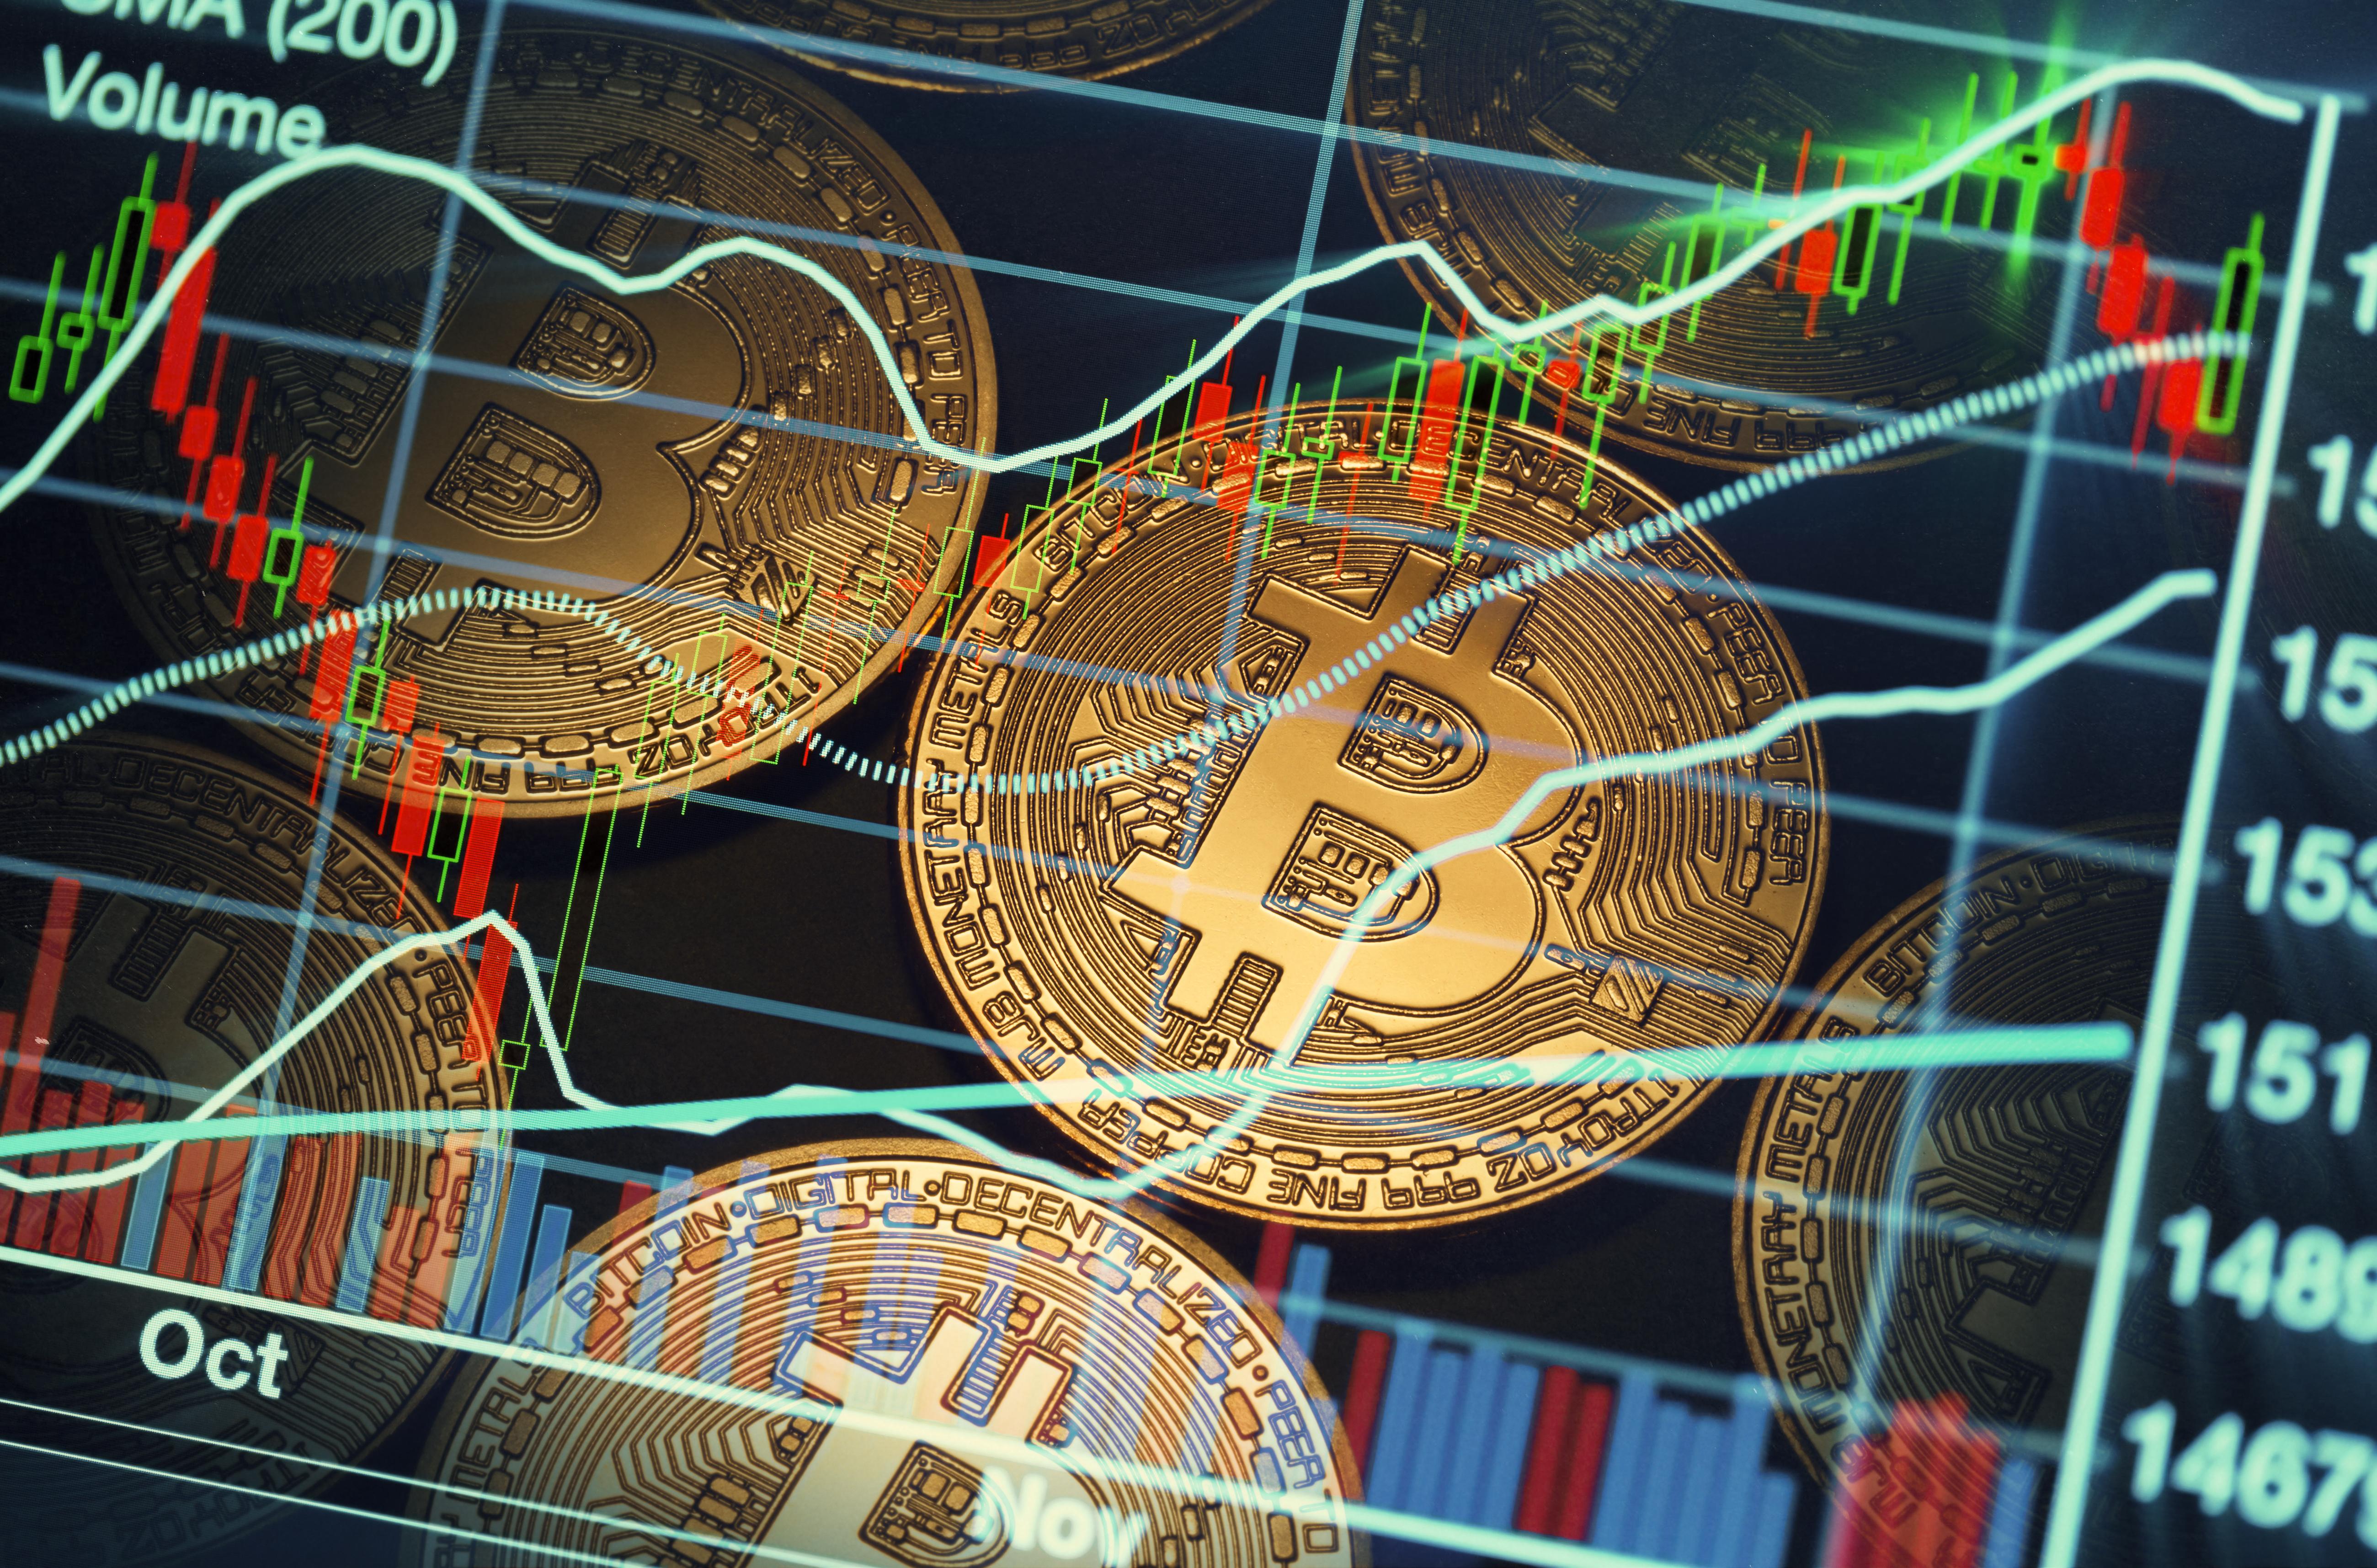 Price chart superimposed on Bitcoin symbols